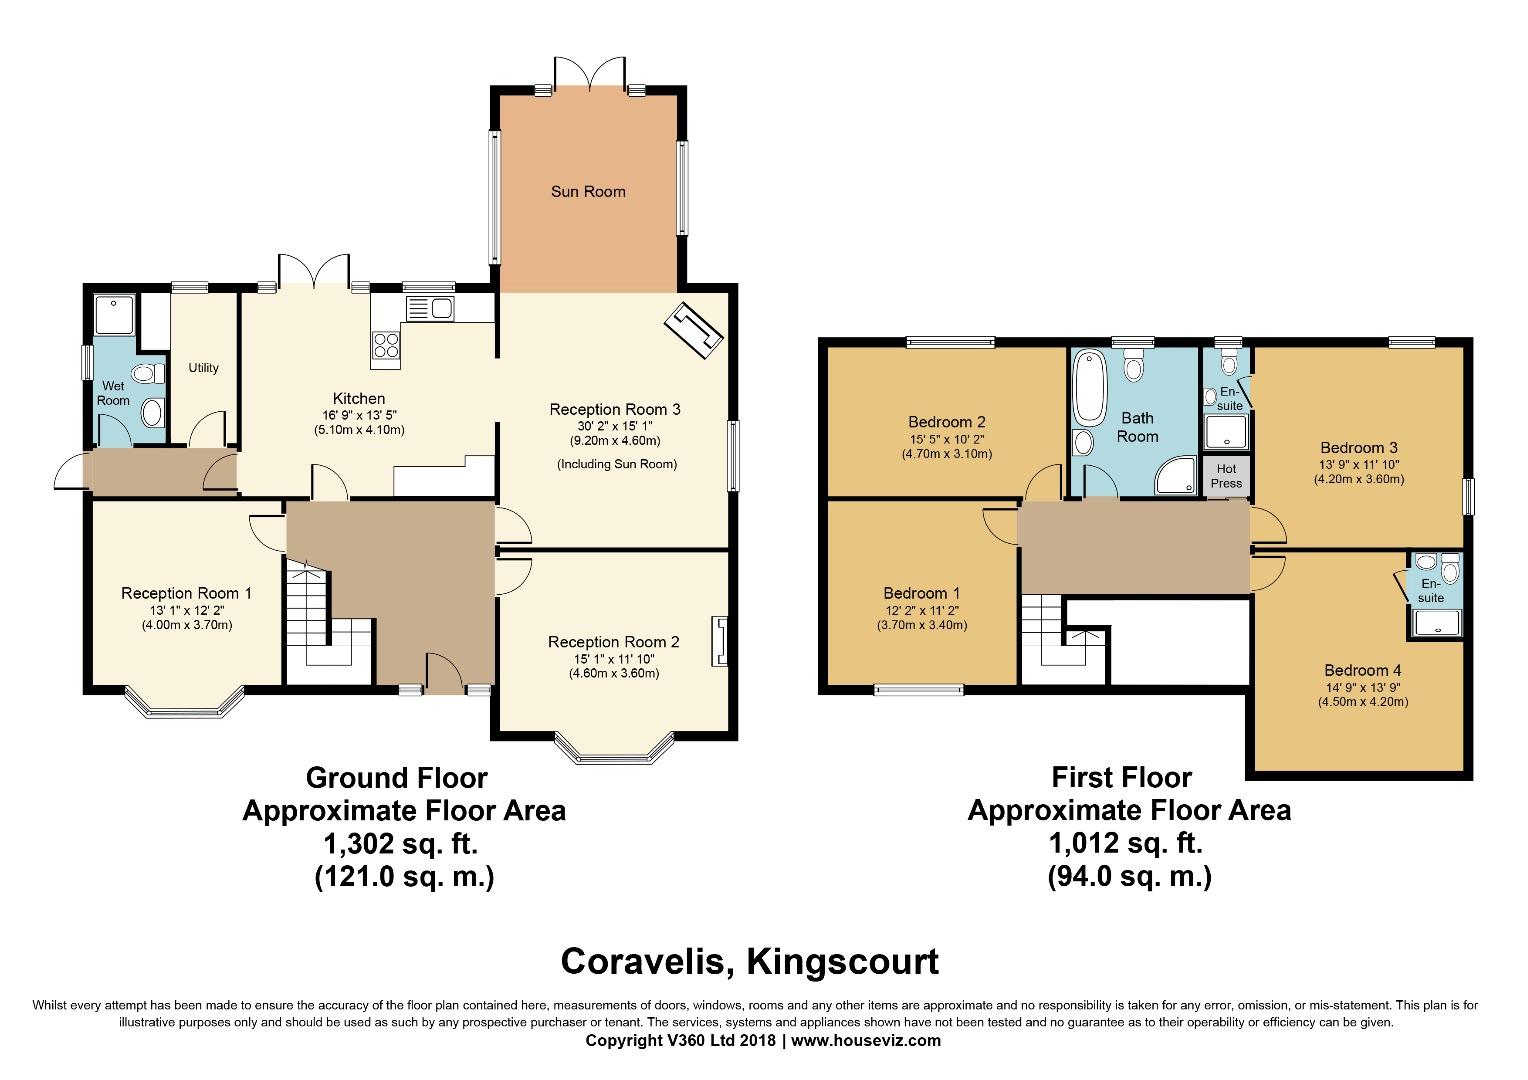 4 bed House for sale on Coravelis, Bailieborough, Co. Cavan - Property Floorplan